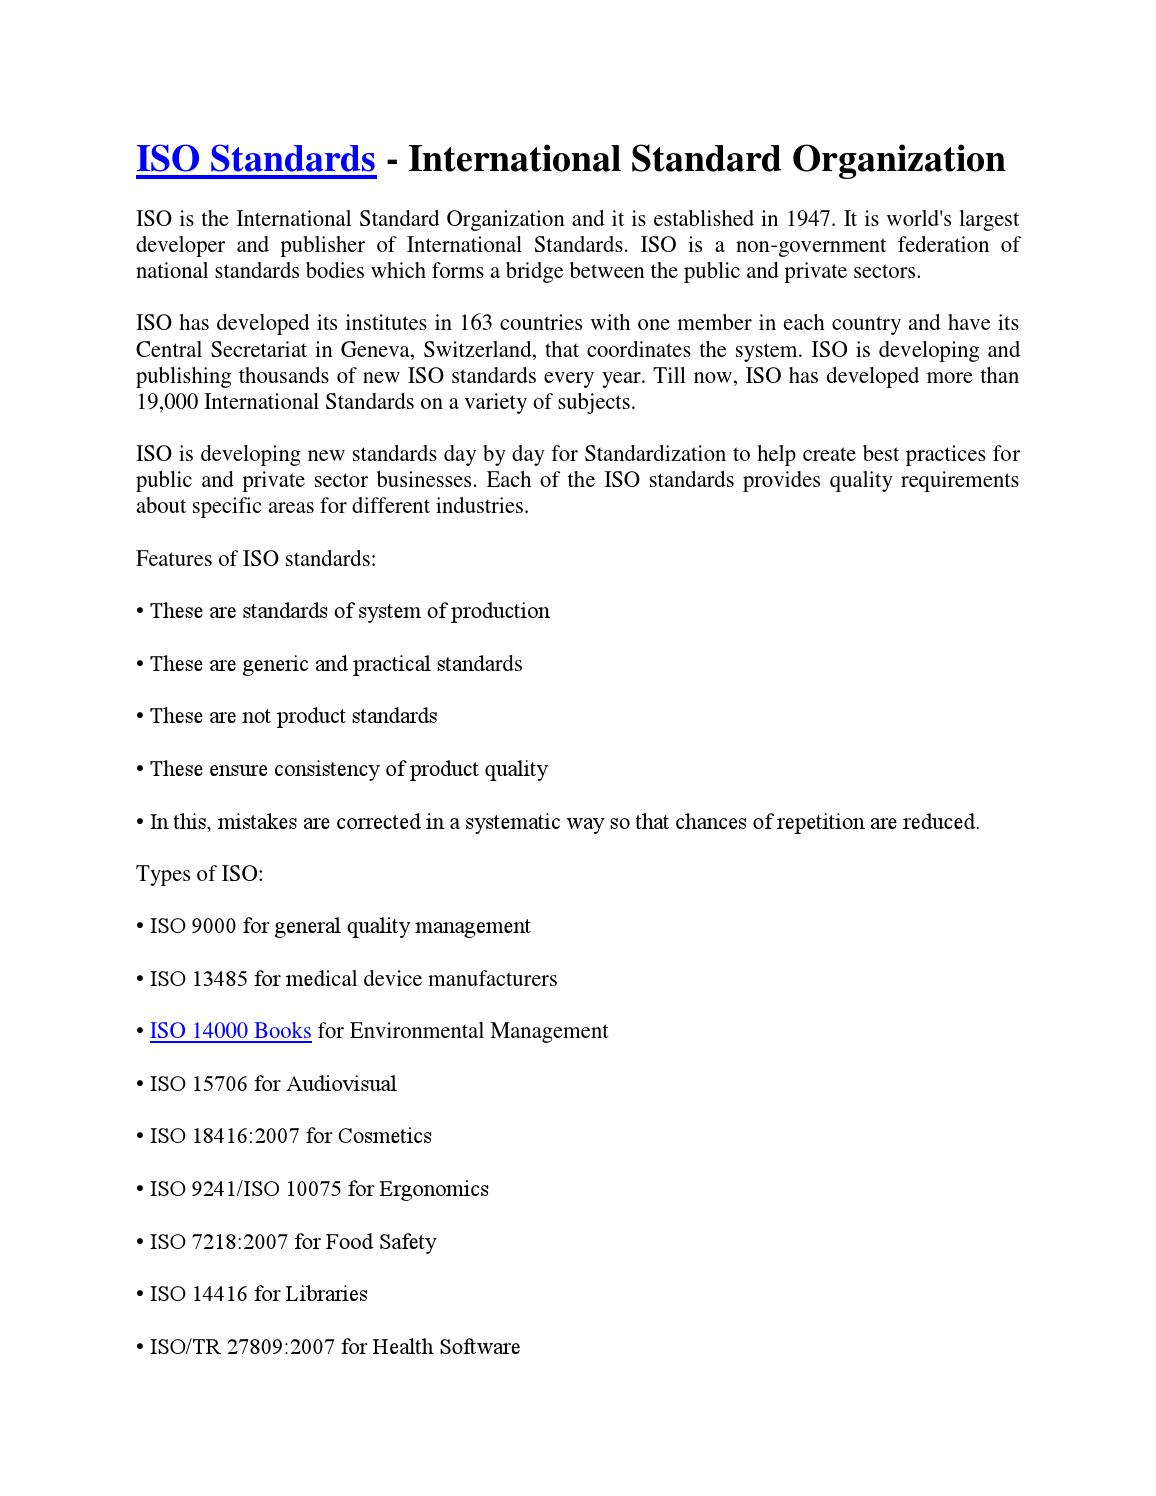 Iso Standards International Standard Organization By